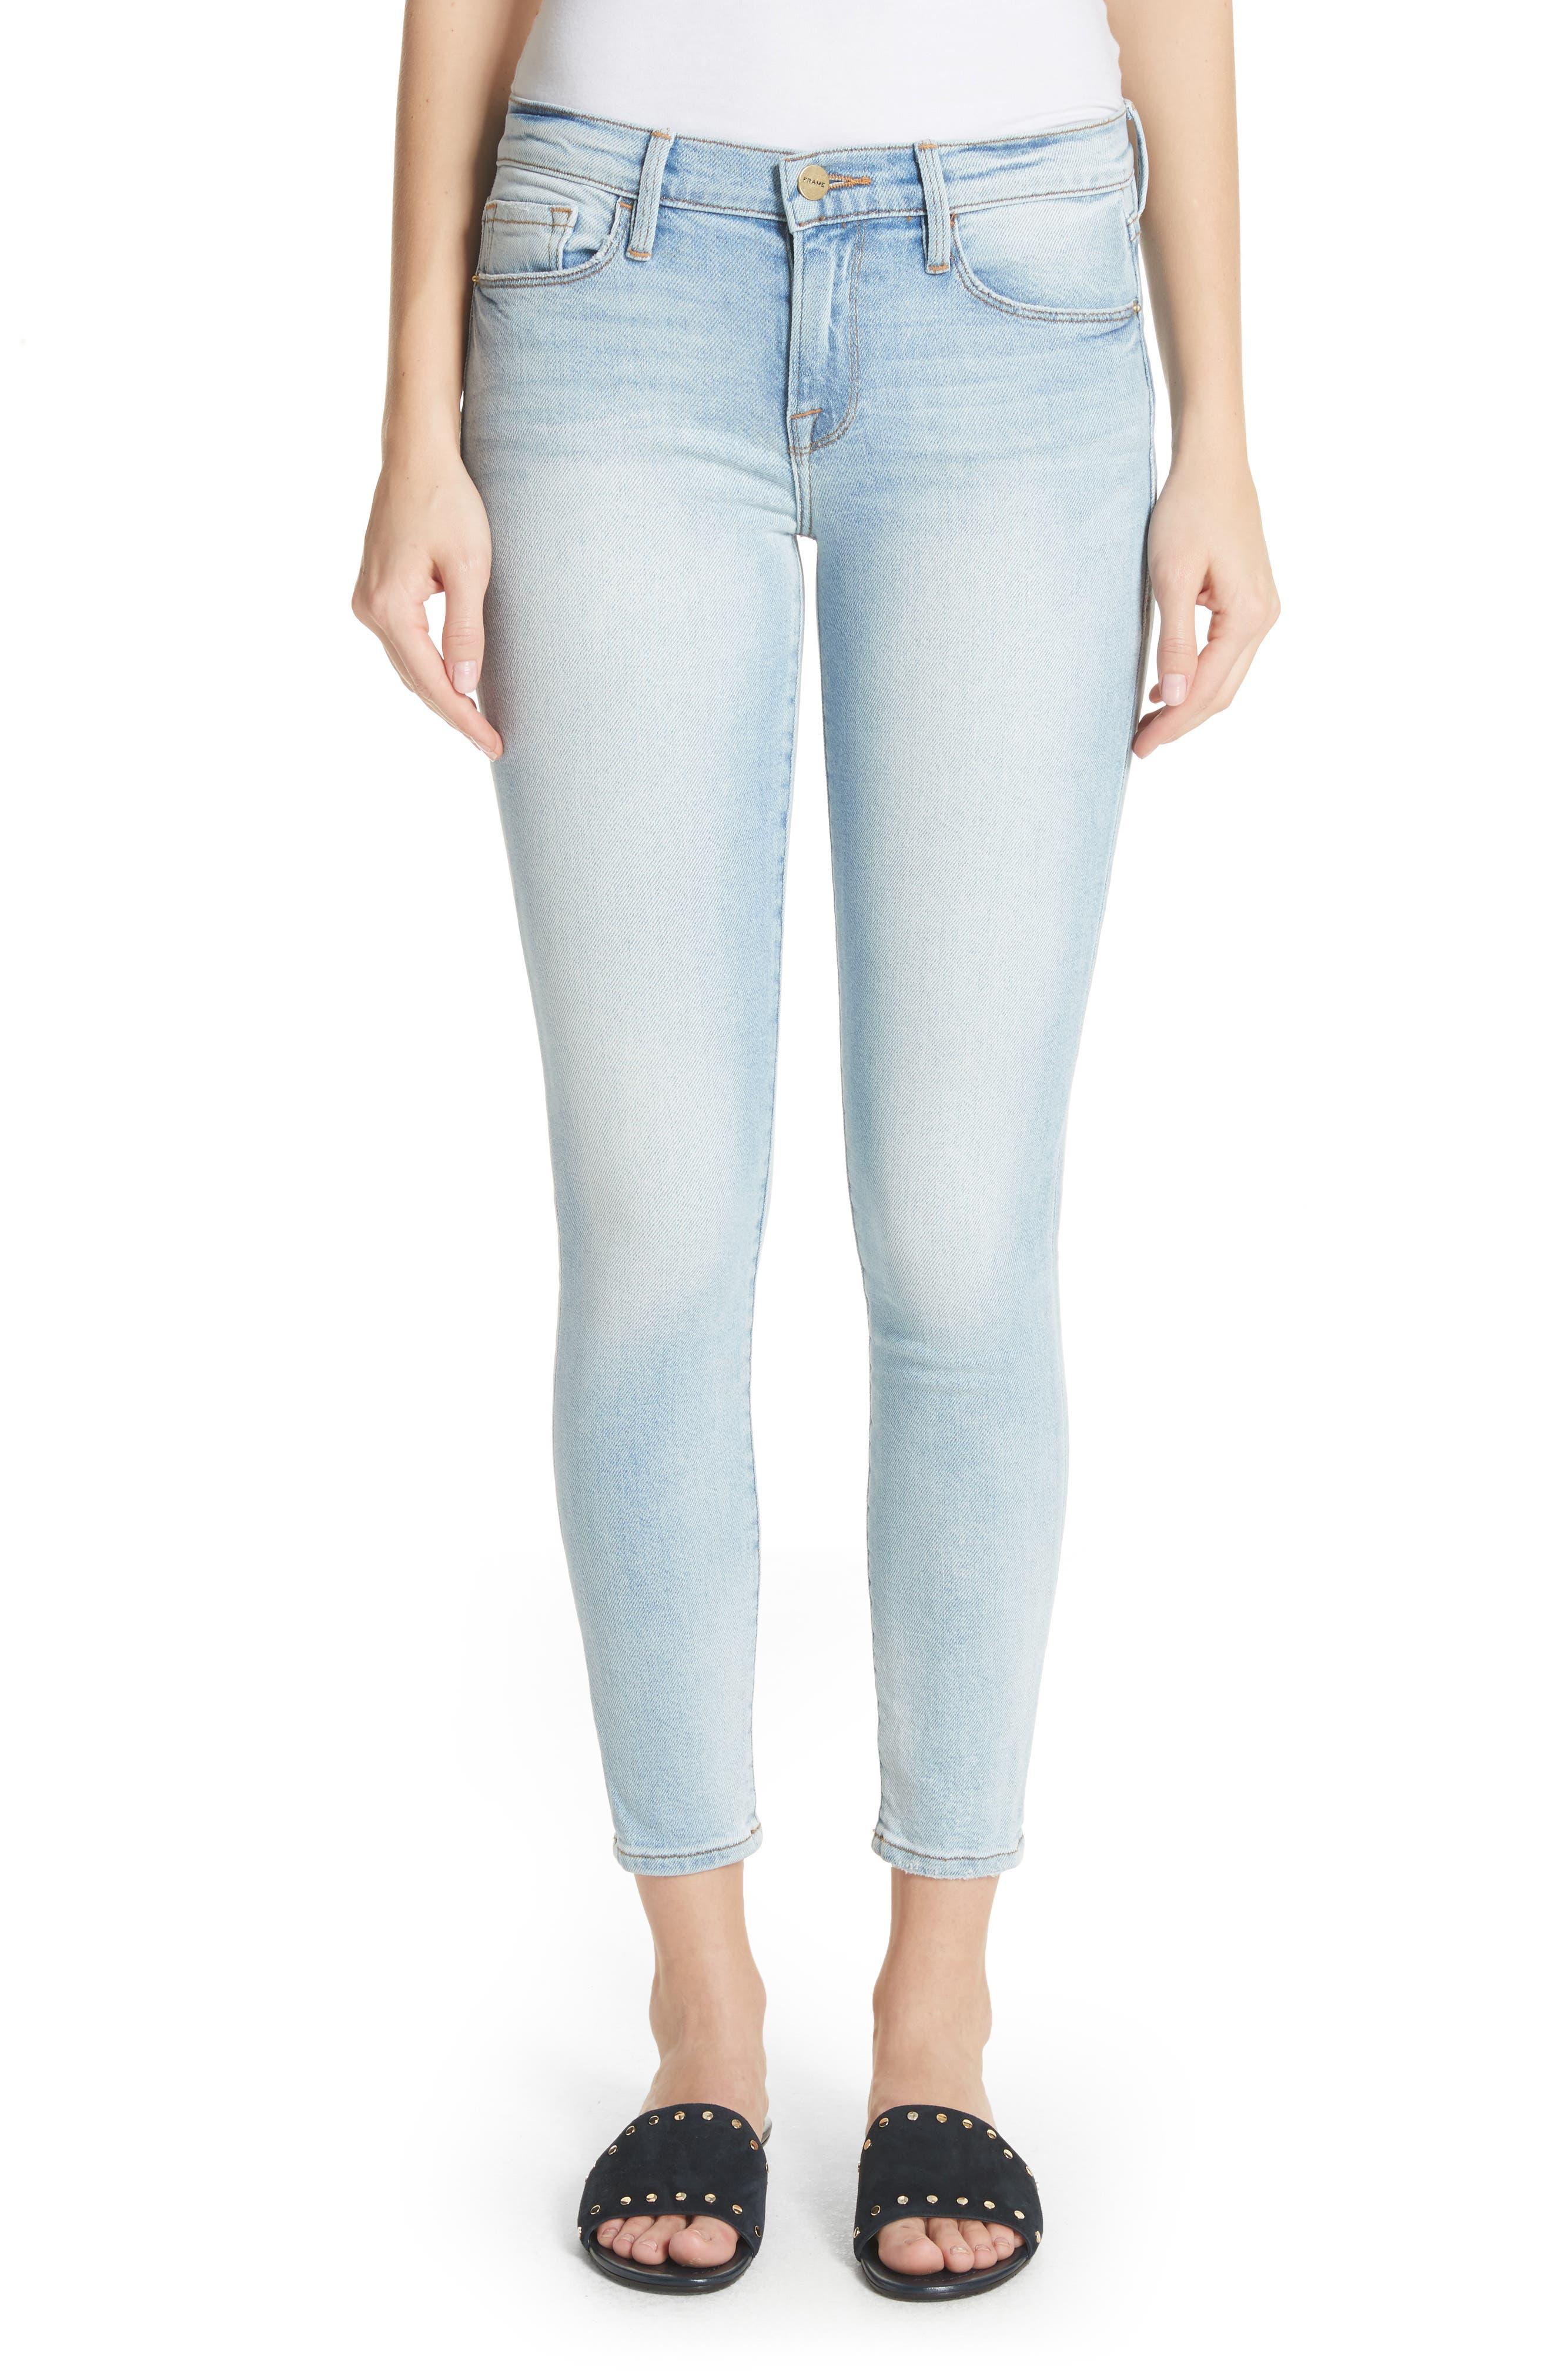 Le Skinny de Jeanne Ankle Jeans,                         Main,                         color, Adeline